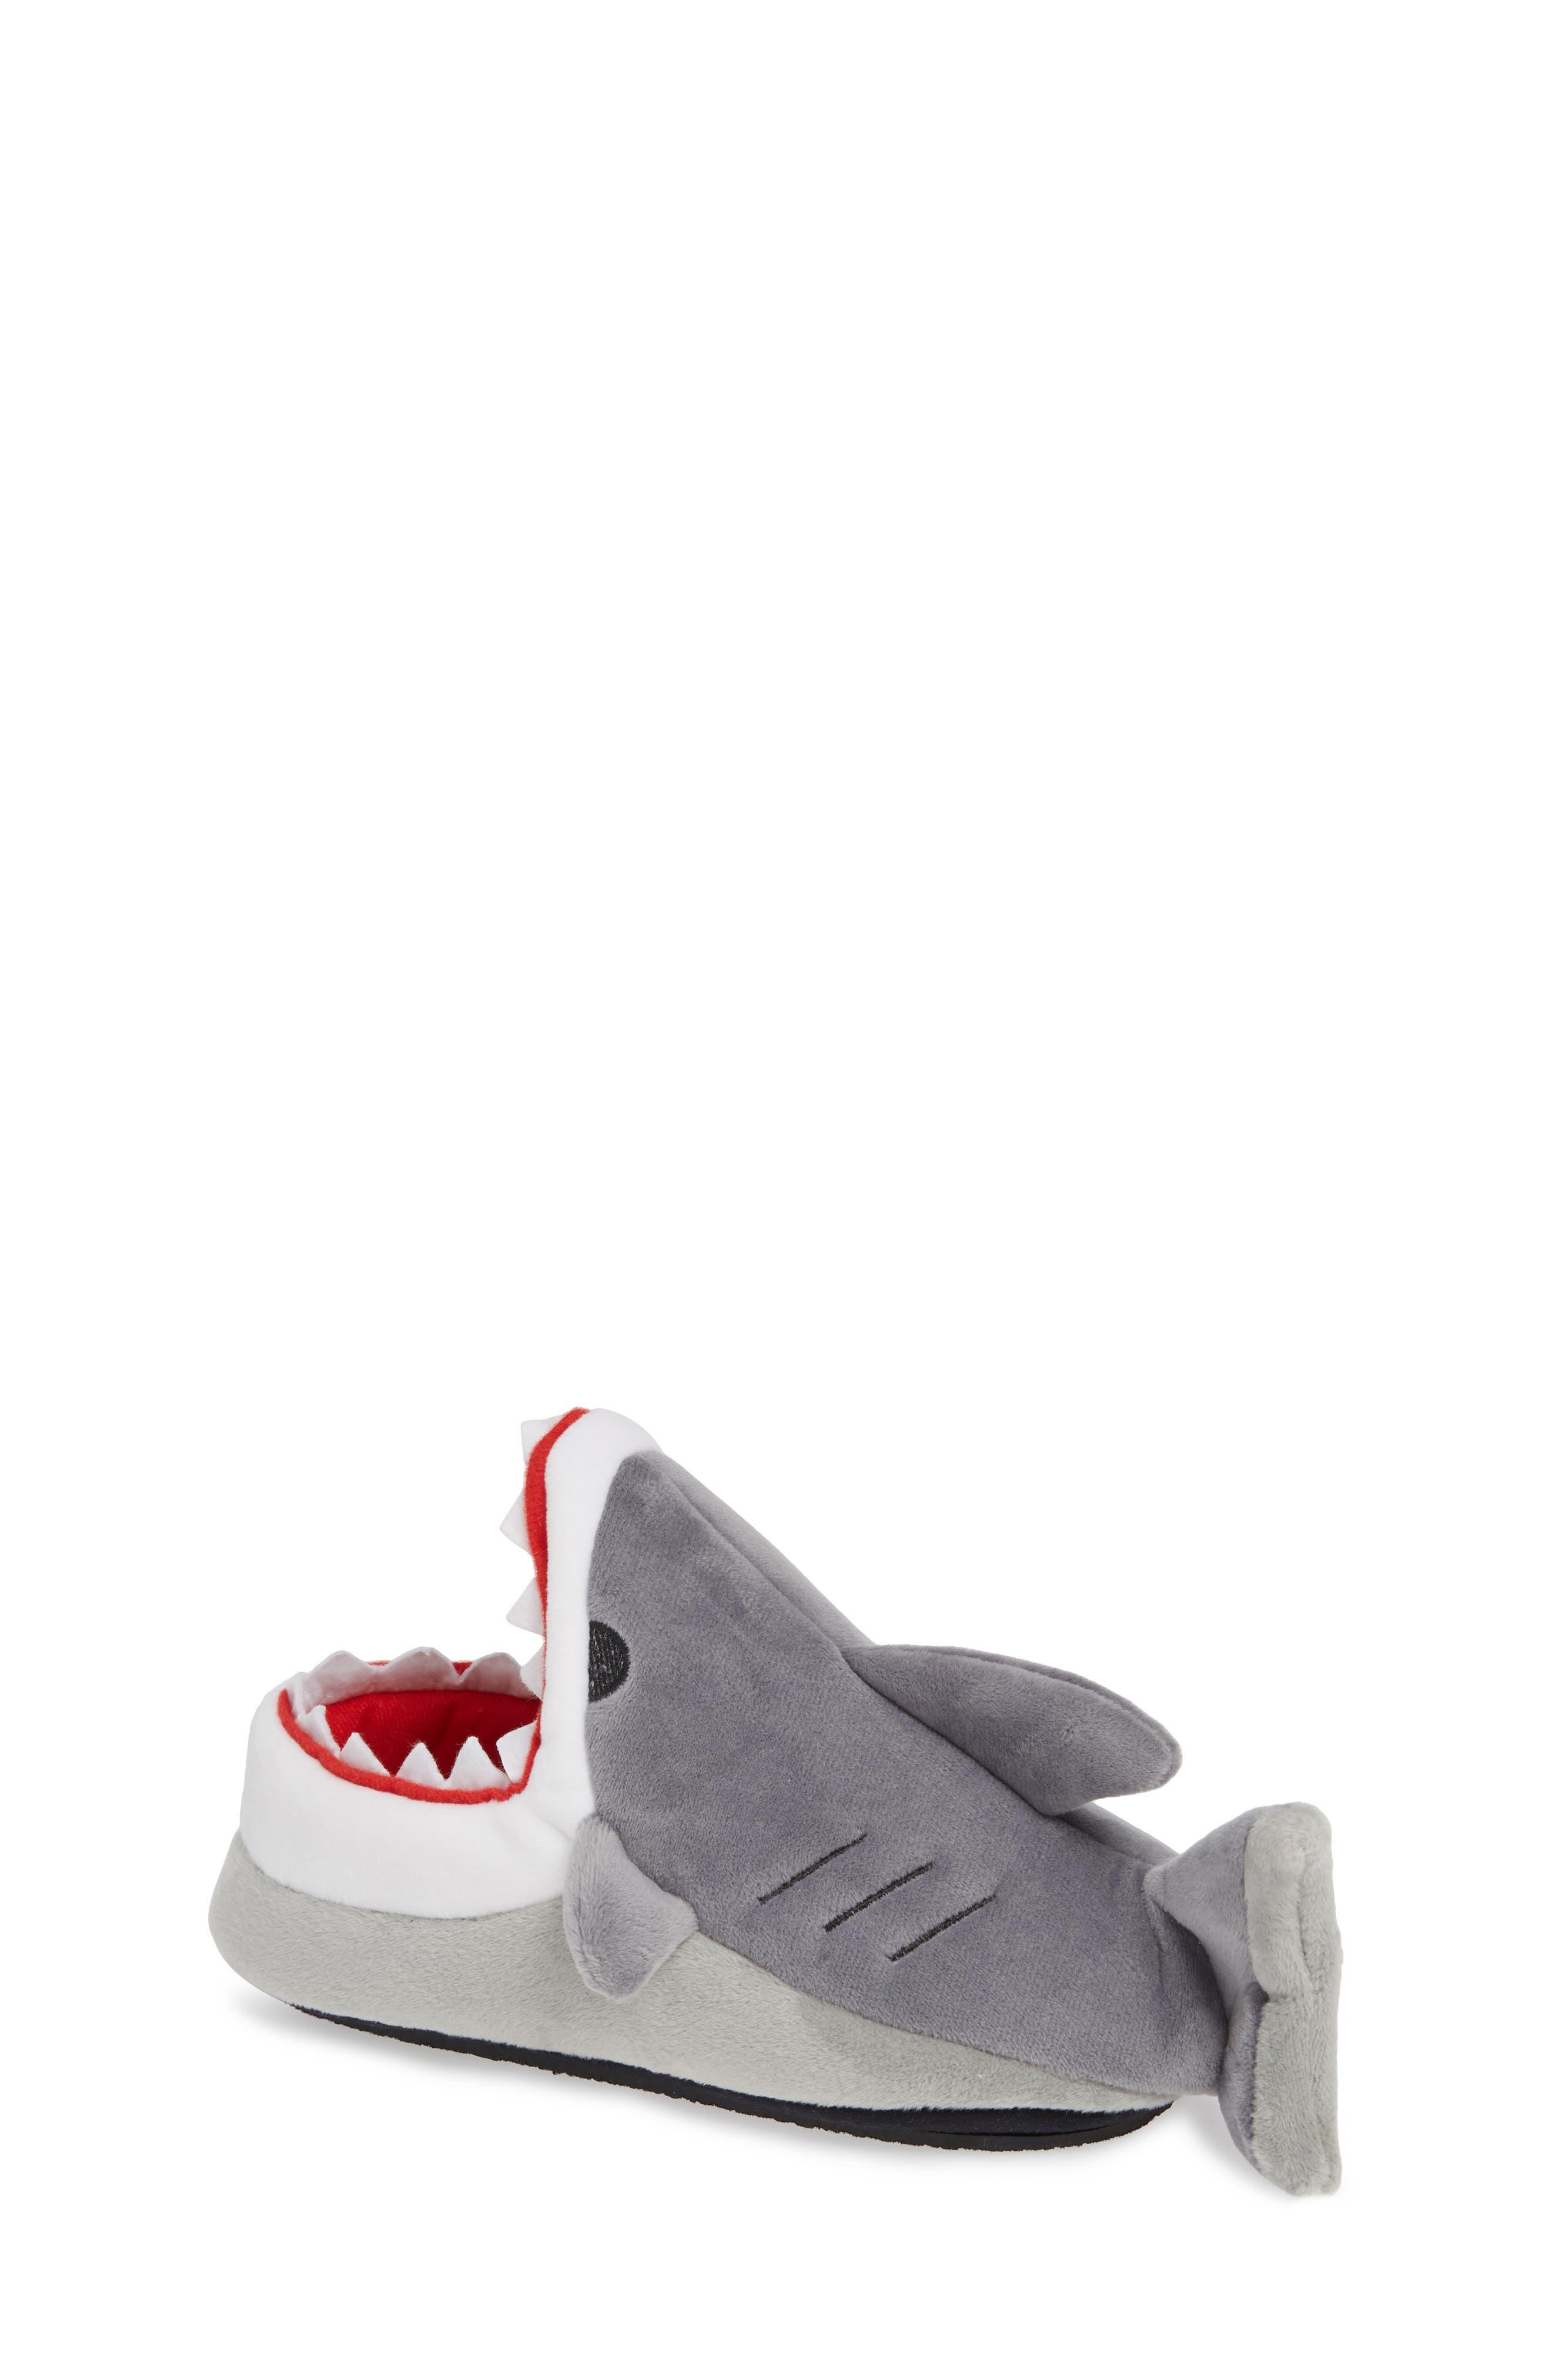 Shark Slipper,                             Main thumbnail 1, color,                             020